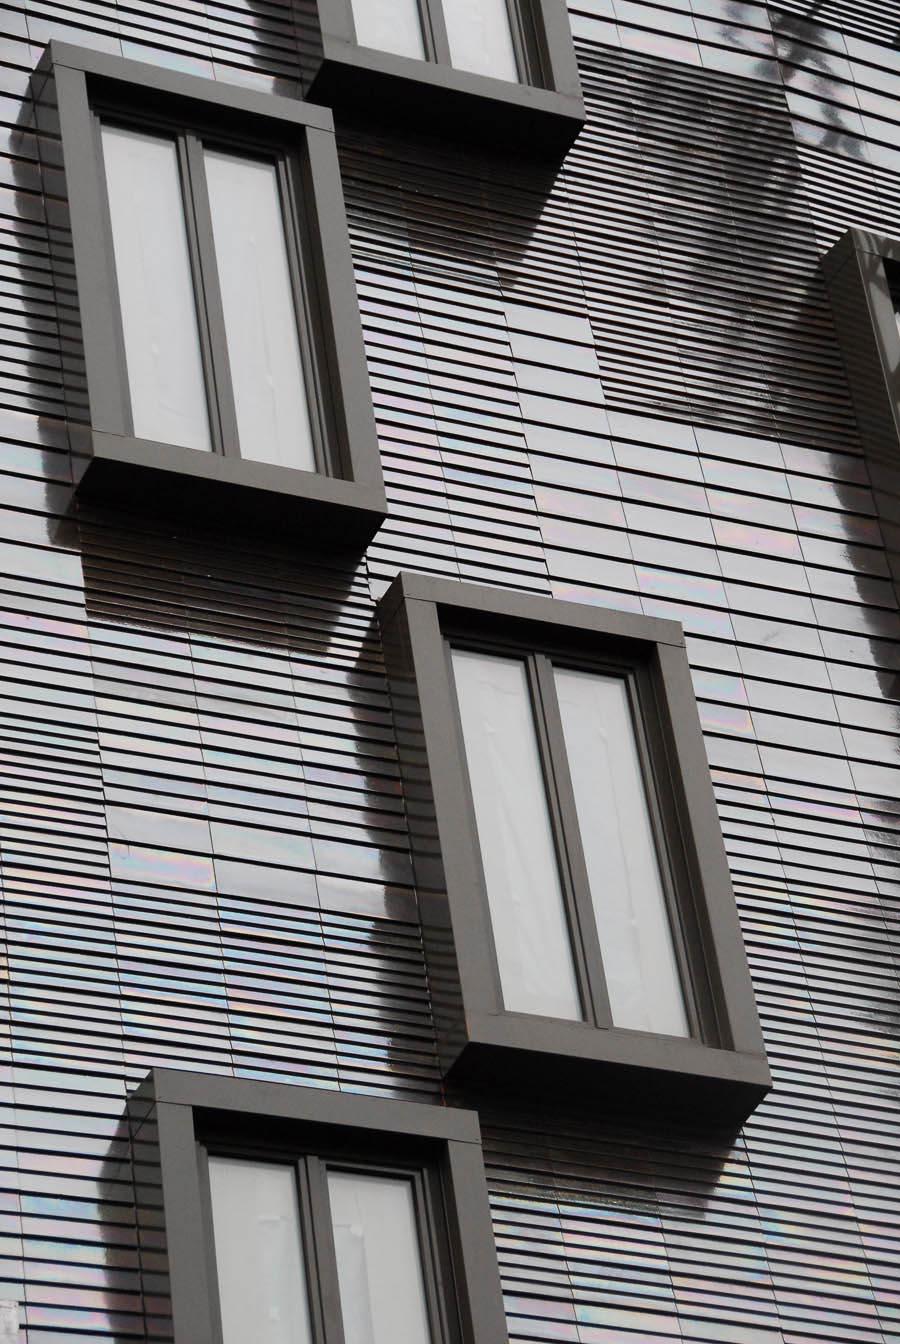 MARIN TROTTN (GRENELLE, Immeuble de 35 logements)